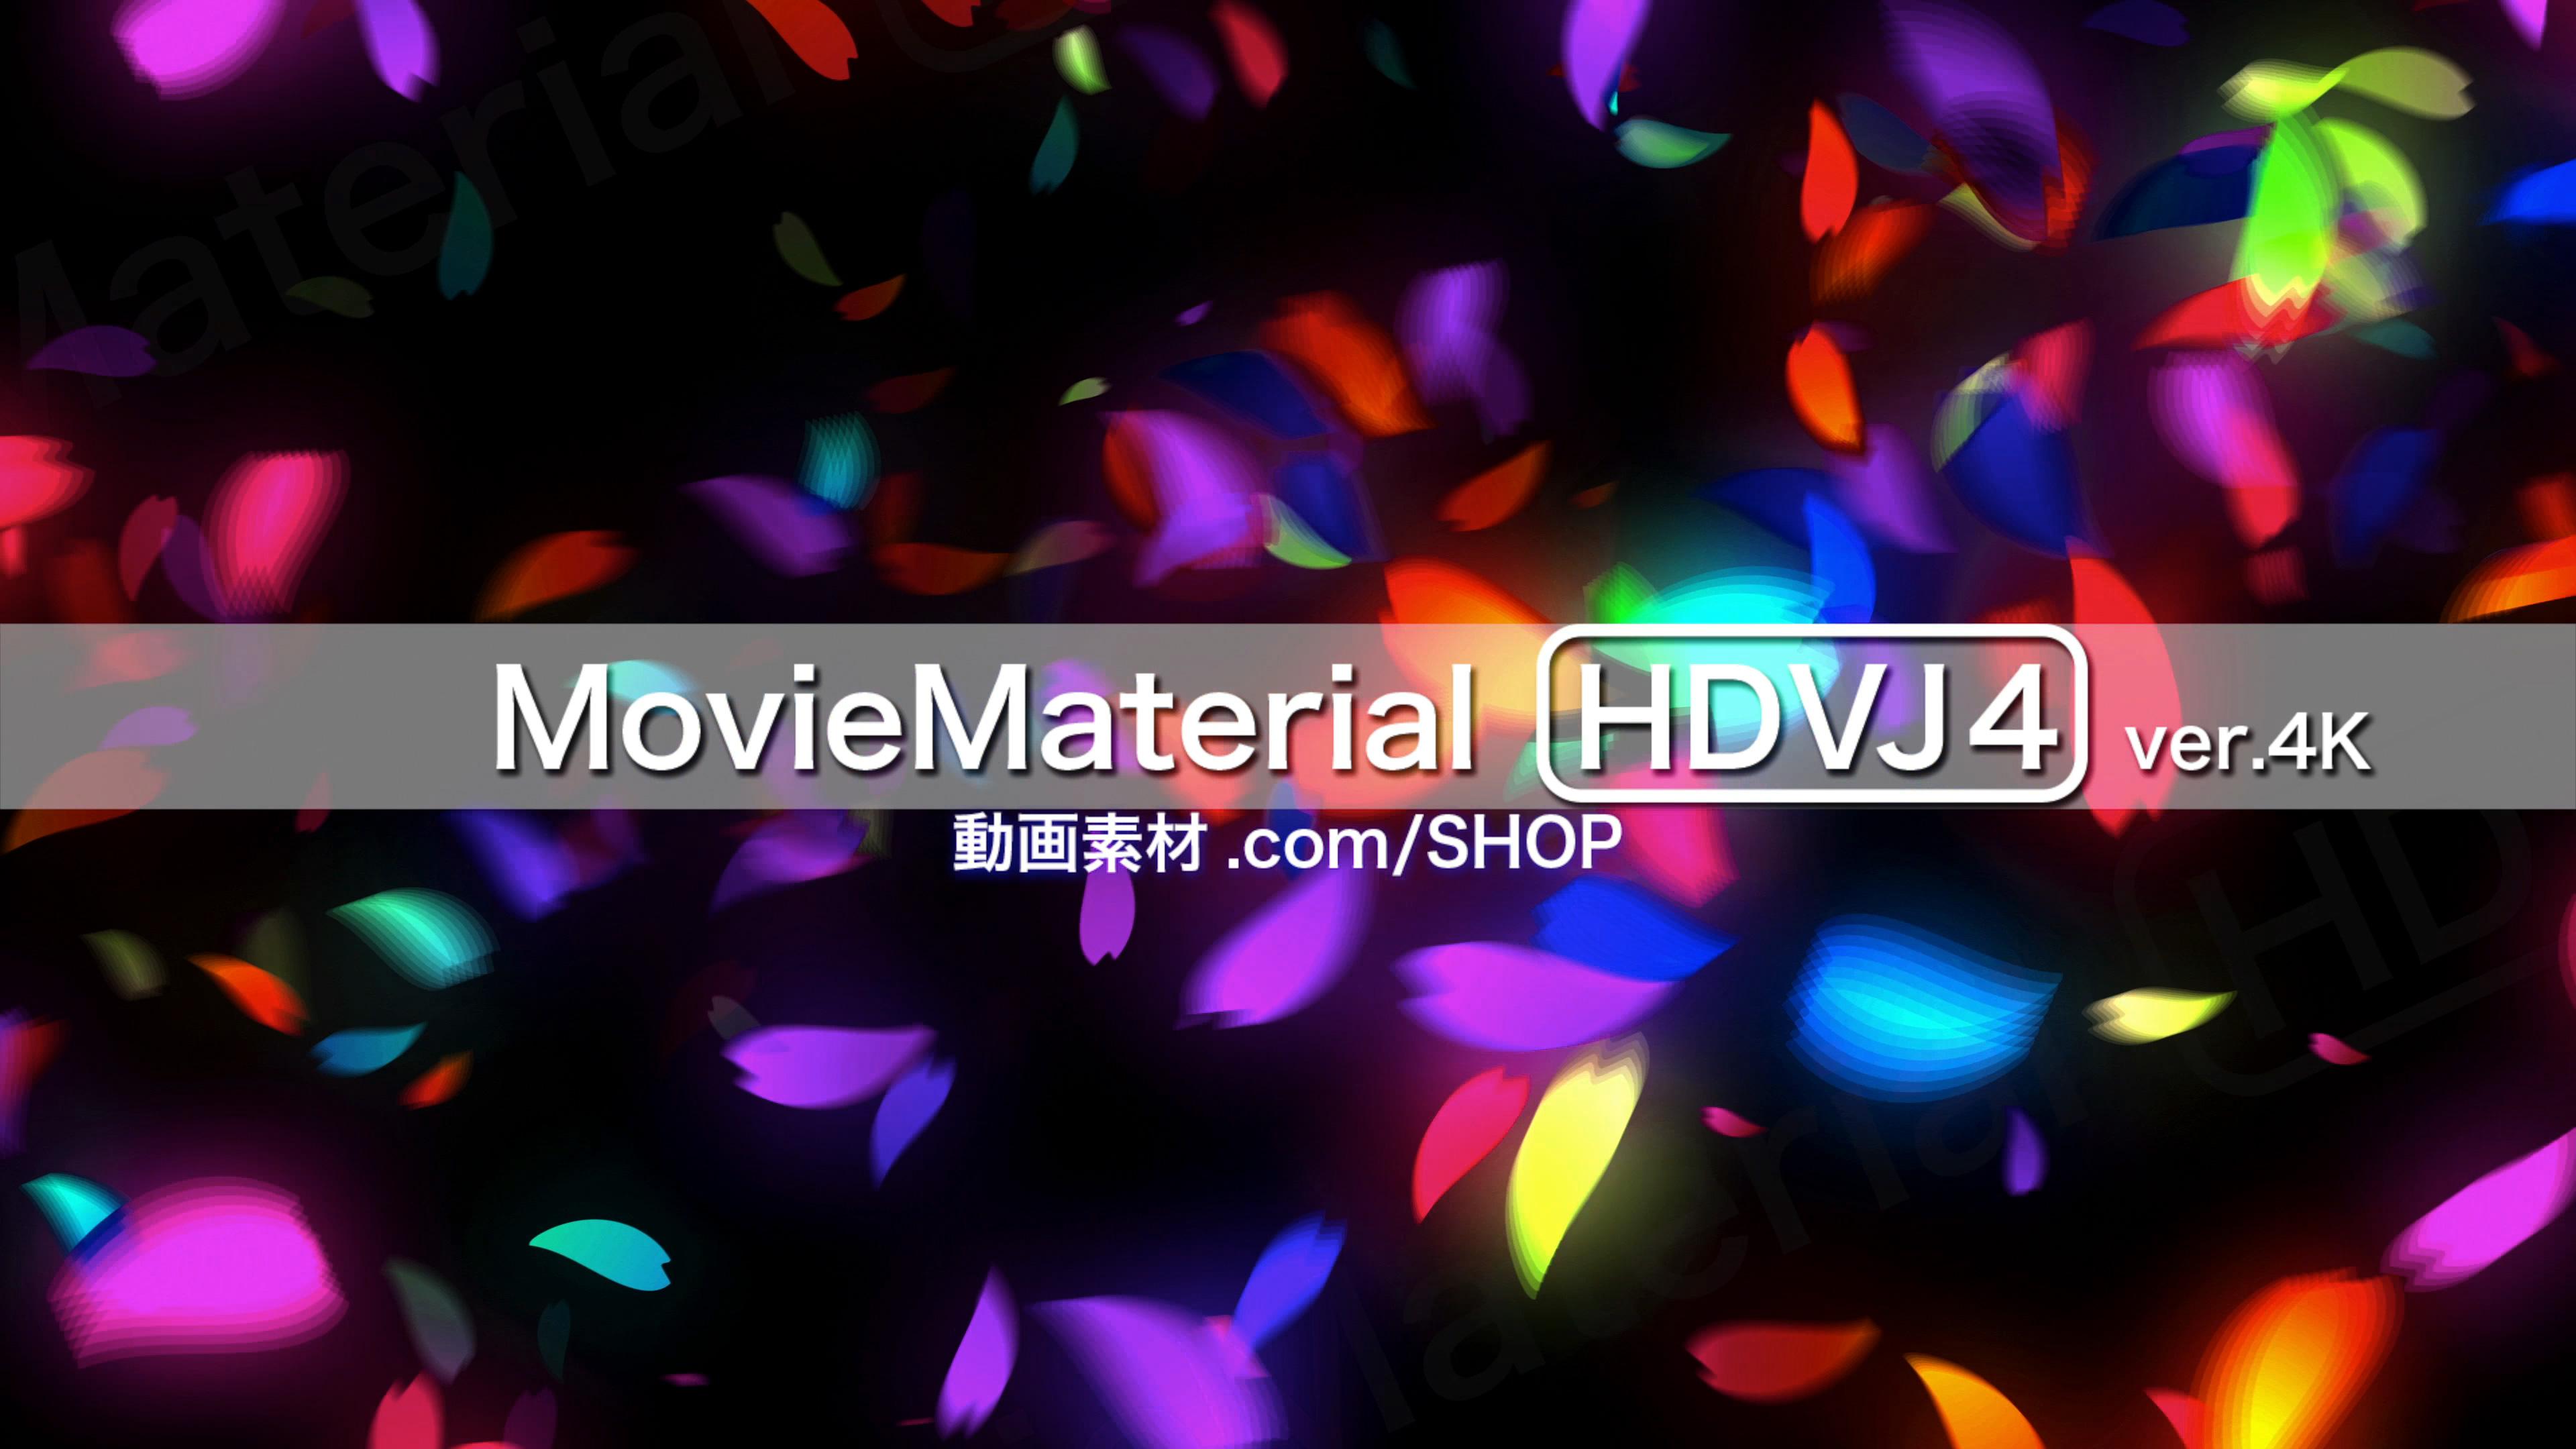 4K2Kループ動画素材集第4段【MovieMaterial HDVJ4 ver.4K】ロイヤリティフリー(著作権使用料無料)2